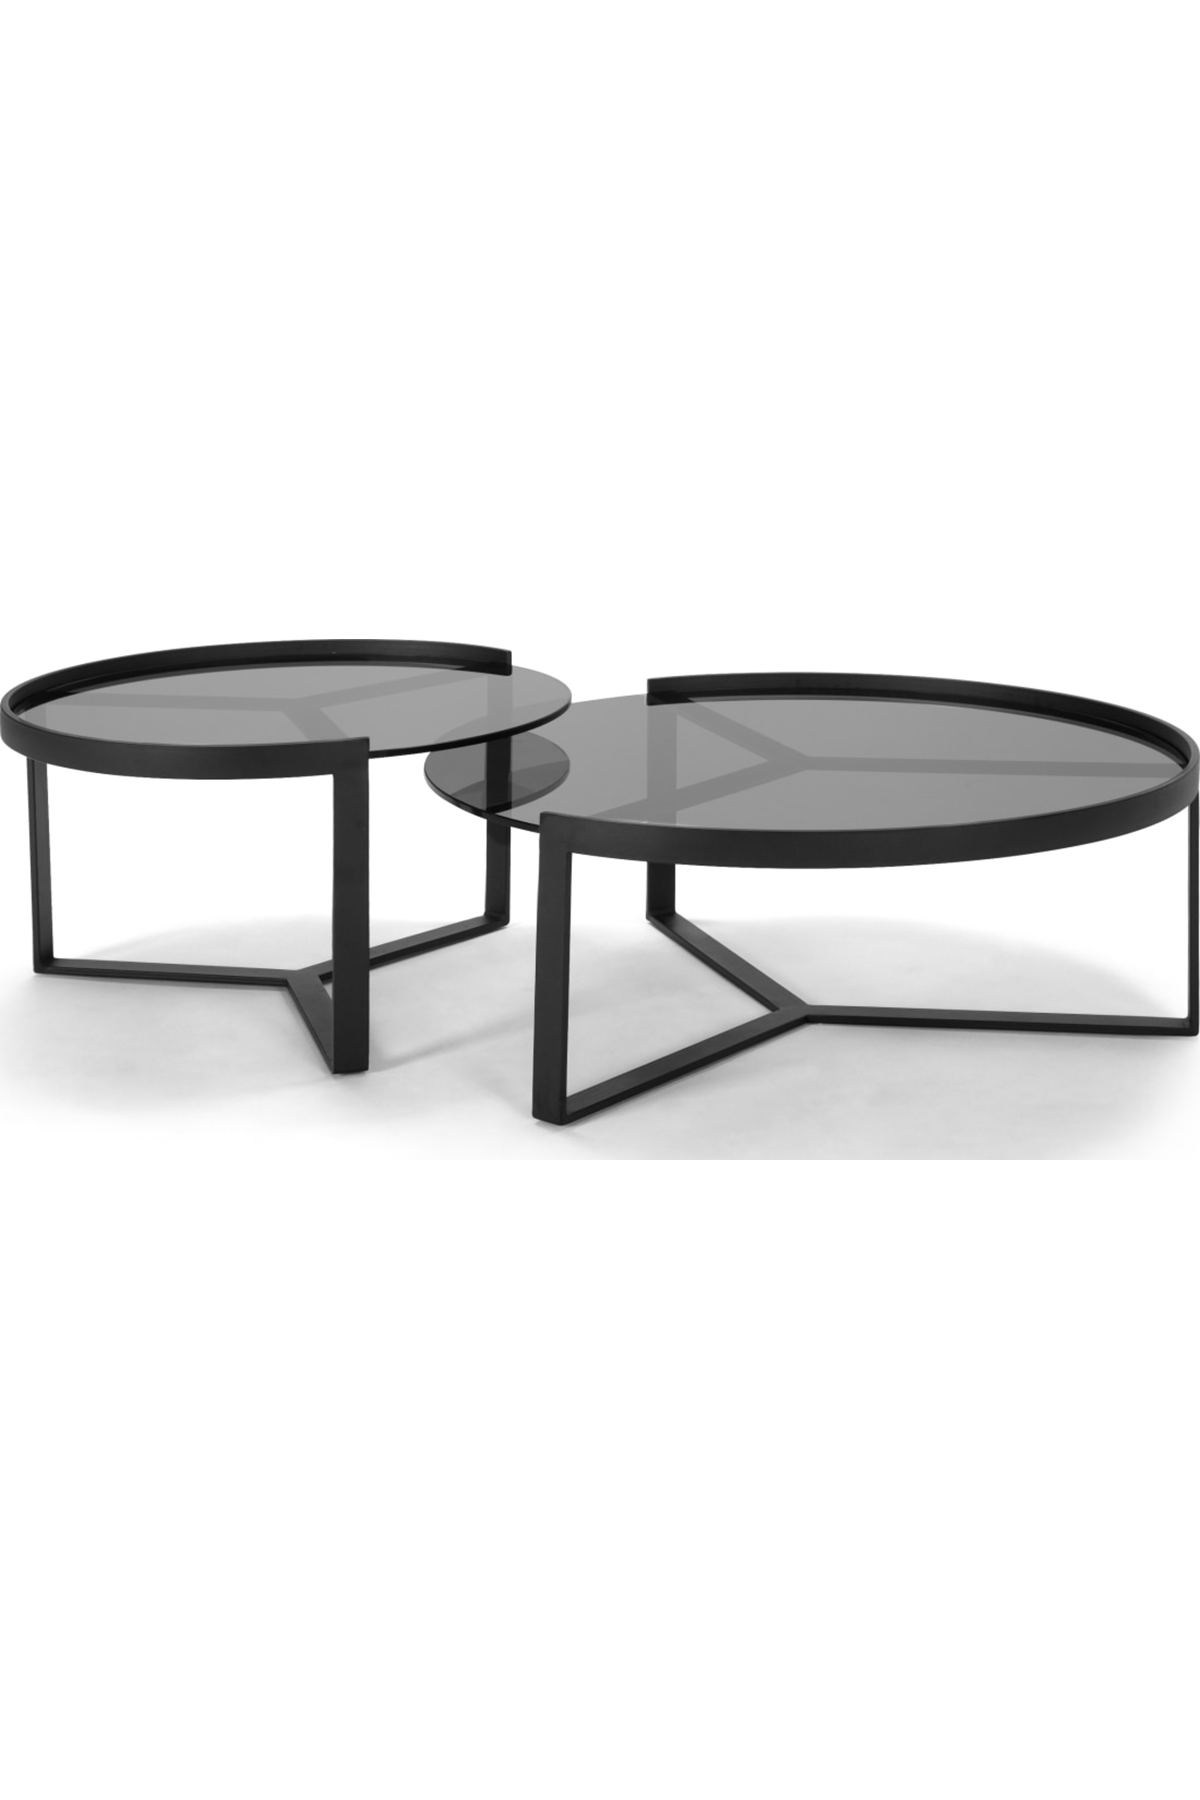 Aula Nesting Coffee Table Black And Grey Nesting Coffee Tables Coffee Table Wood Coffee Table